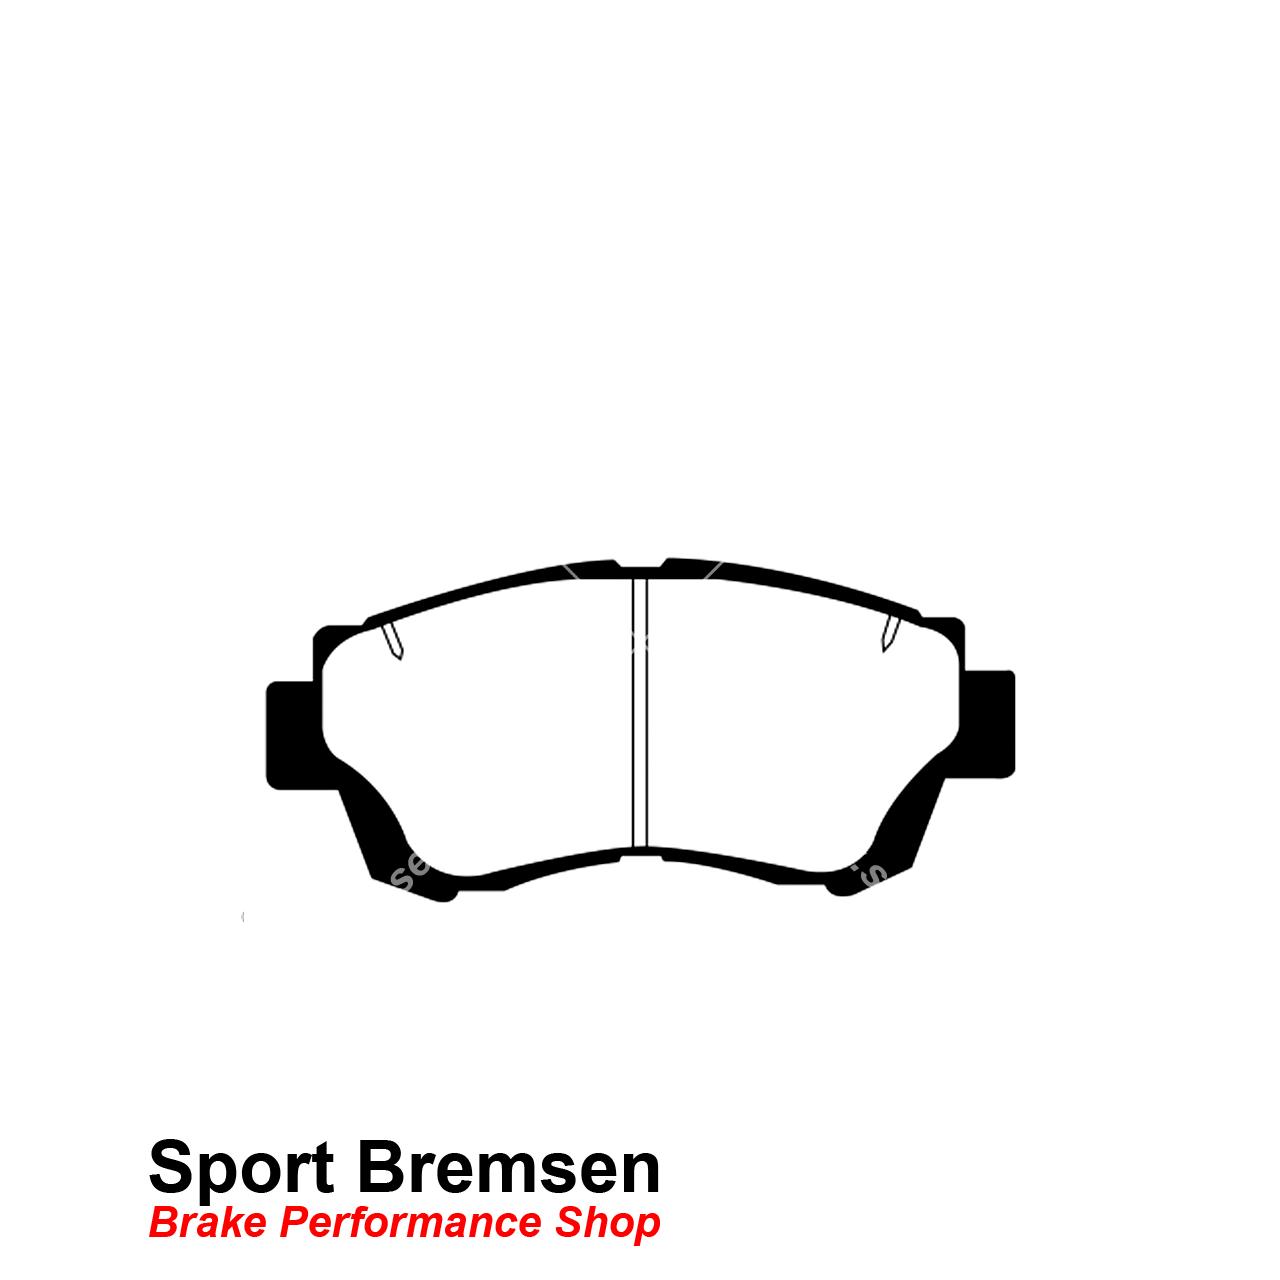 Ebc Yellowstuff Bremsbelage Fur Toyota Celica 6 T20 2 0